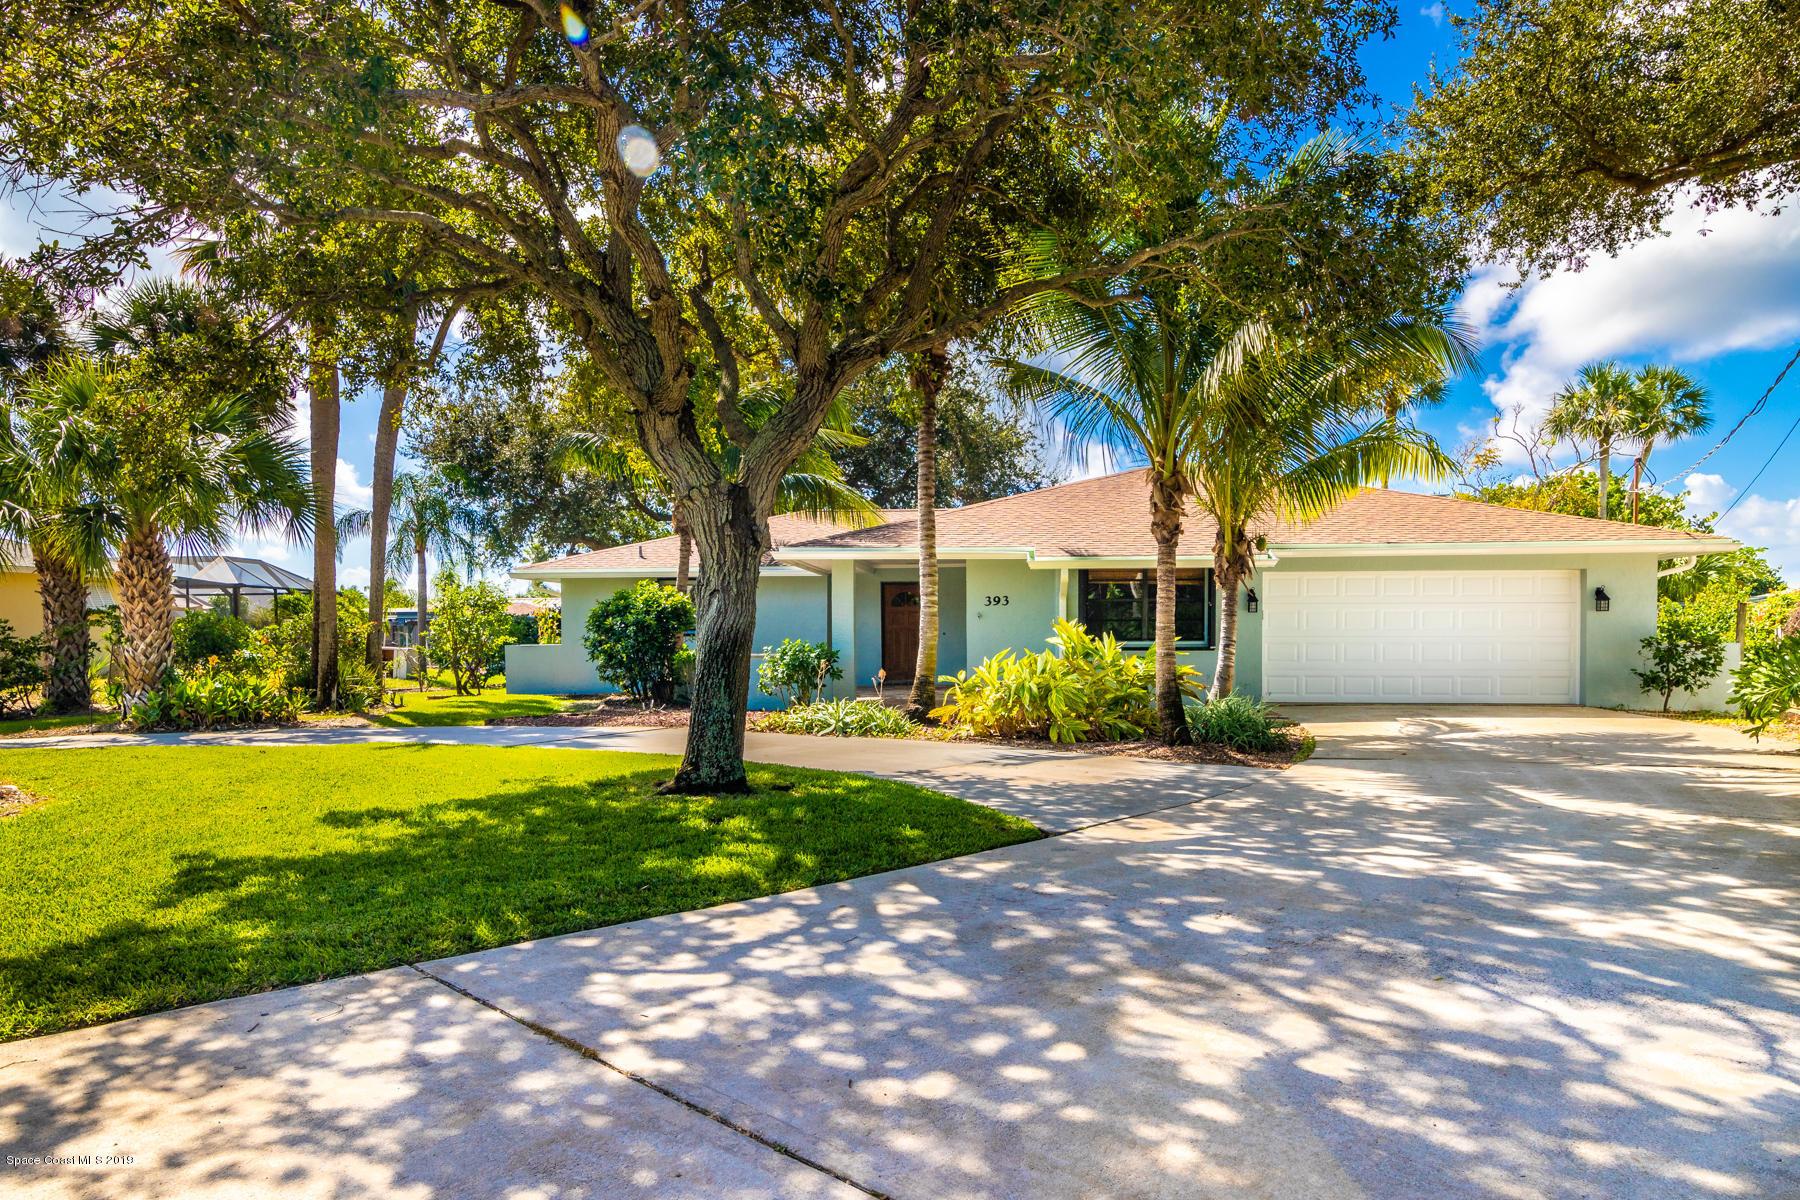 Single Family Homes for Sale at 393 Nikomas Melbourne Beach, Florida 32951 United States